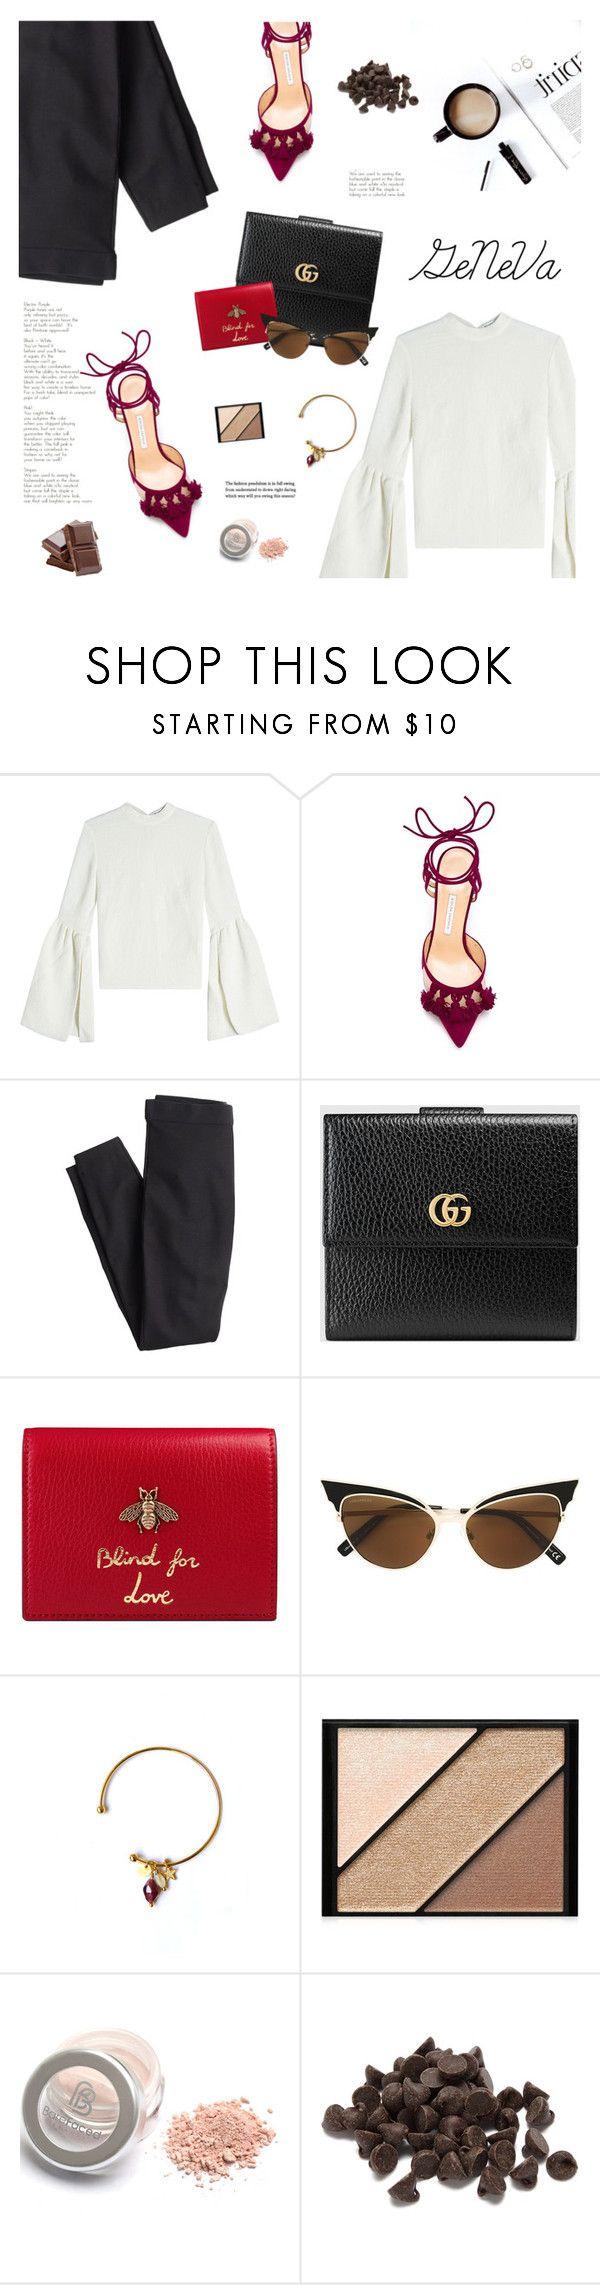 """Geneva Travel Outfit"" by tamo-kipshidze ❤ liked on Polyvore featuring Rejina Pyo, Bionda Castana, J.Crew, Gucci, Dsquared2, Elizabeth Arden, chocolate, Europe, Switzerland and geneva"